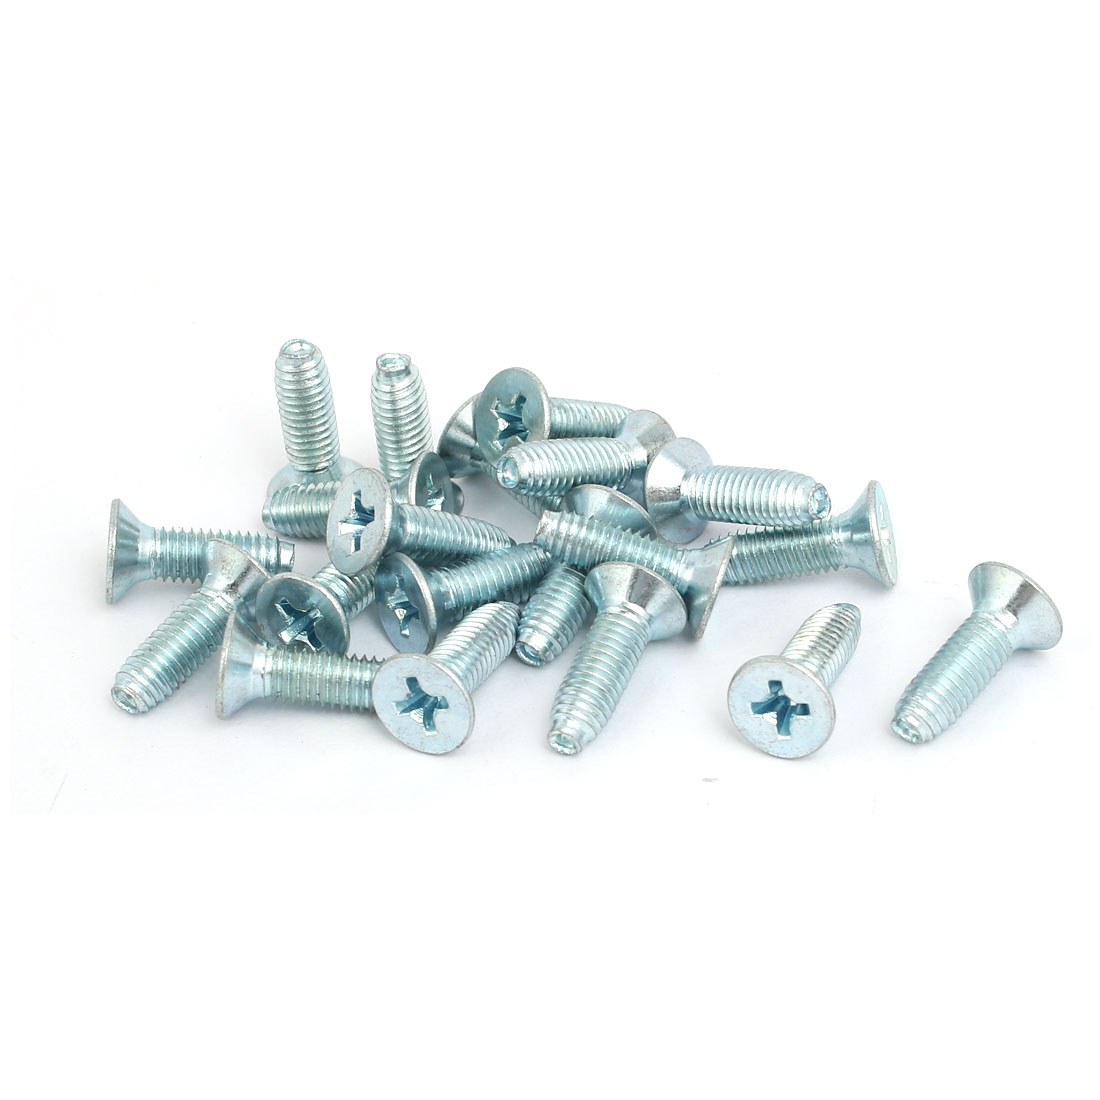 M5x16mm Countersunk Phillips Head Triangle Thread Screw Bolt Silver Blue 20pcs